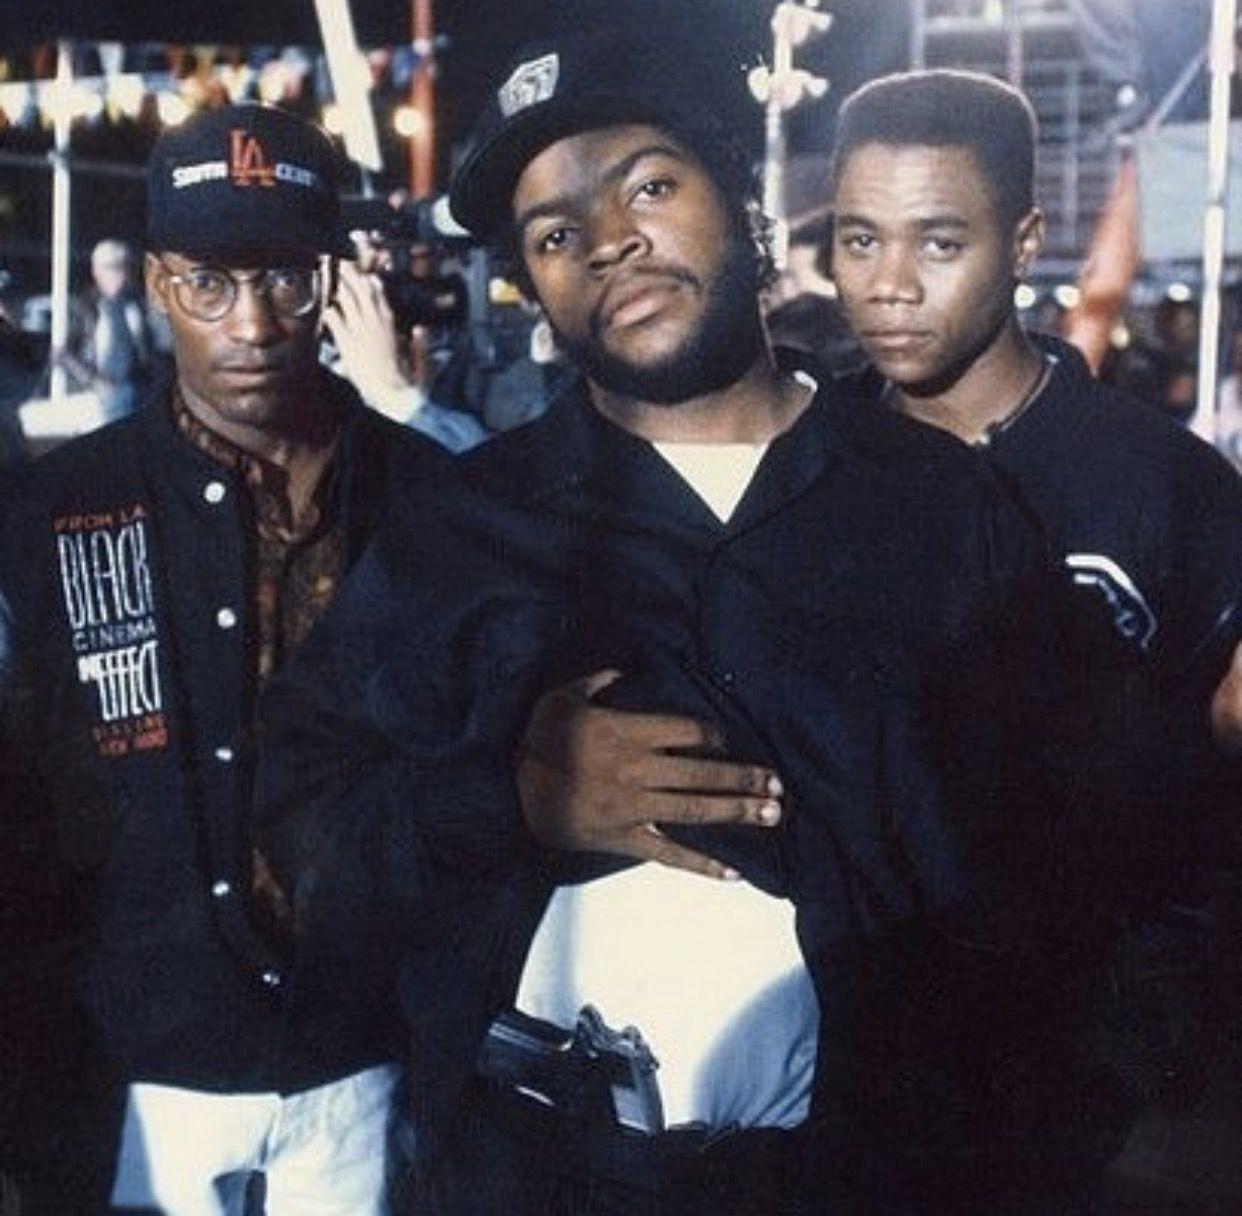 Boyz in the hood 90s black movies hip hop culture